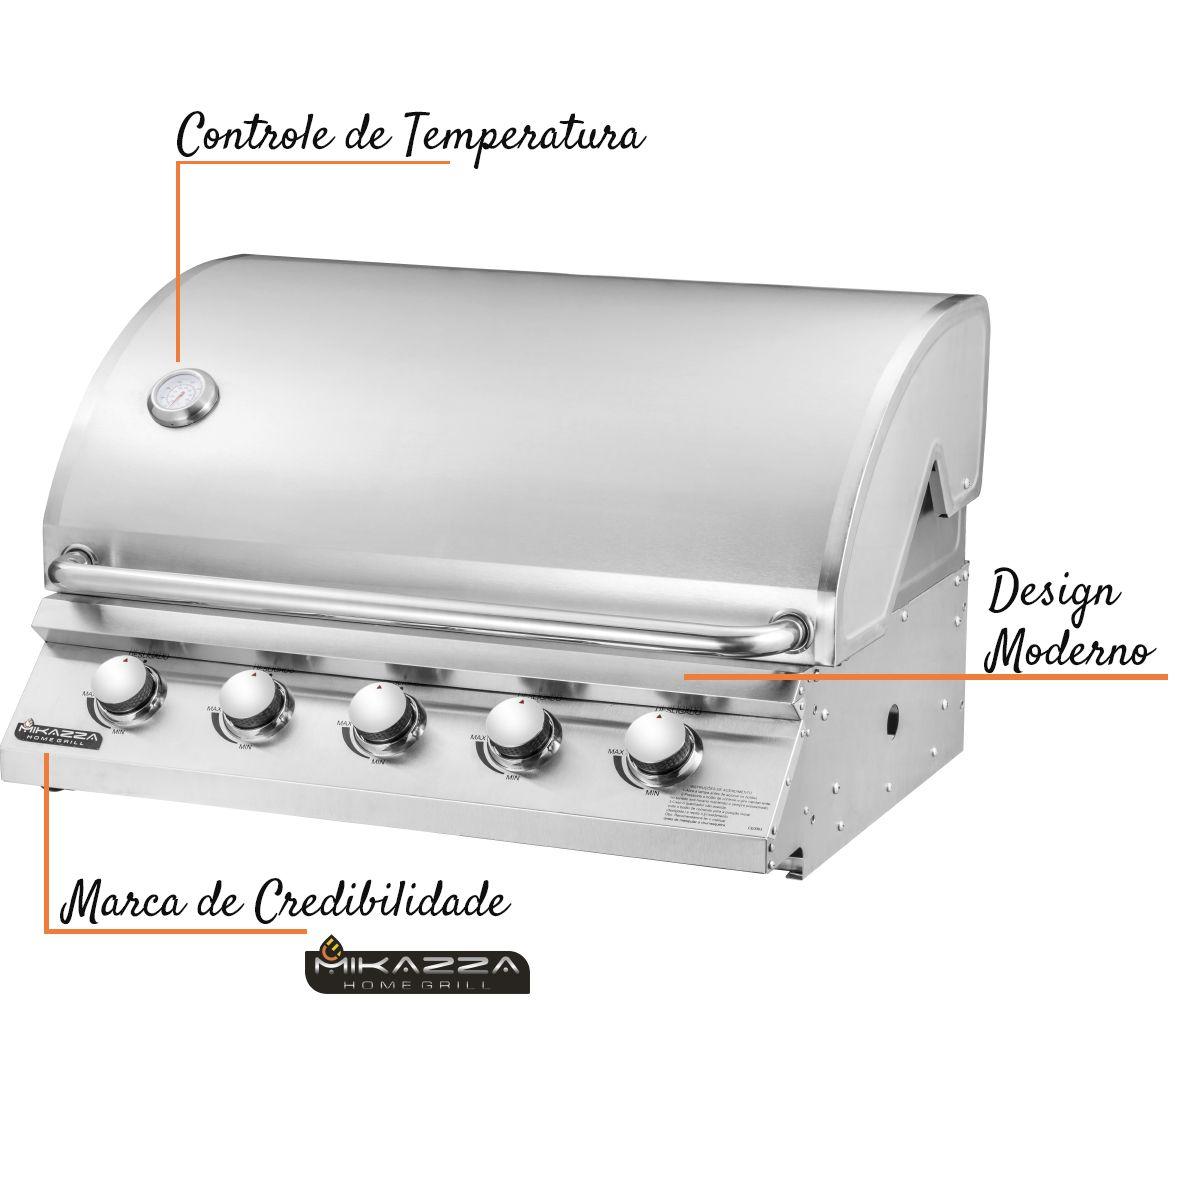 Churrasqueira à Gás Embutir Mikazza Pro 5 Combo + Chapa + Espeto Giratório + Tramontina